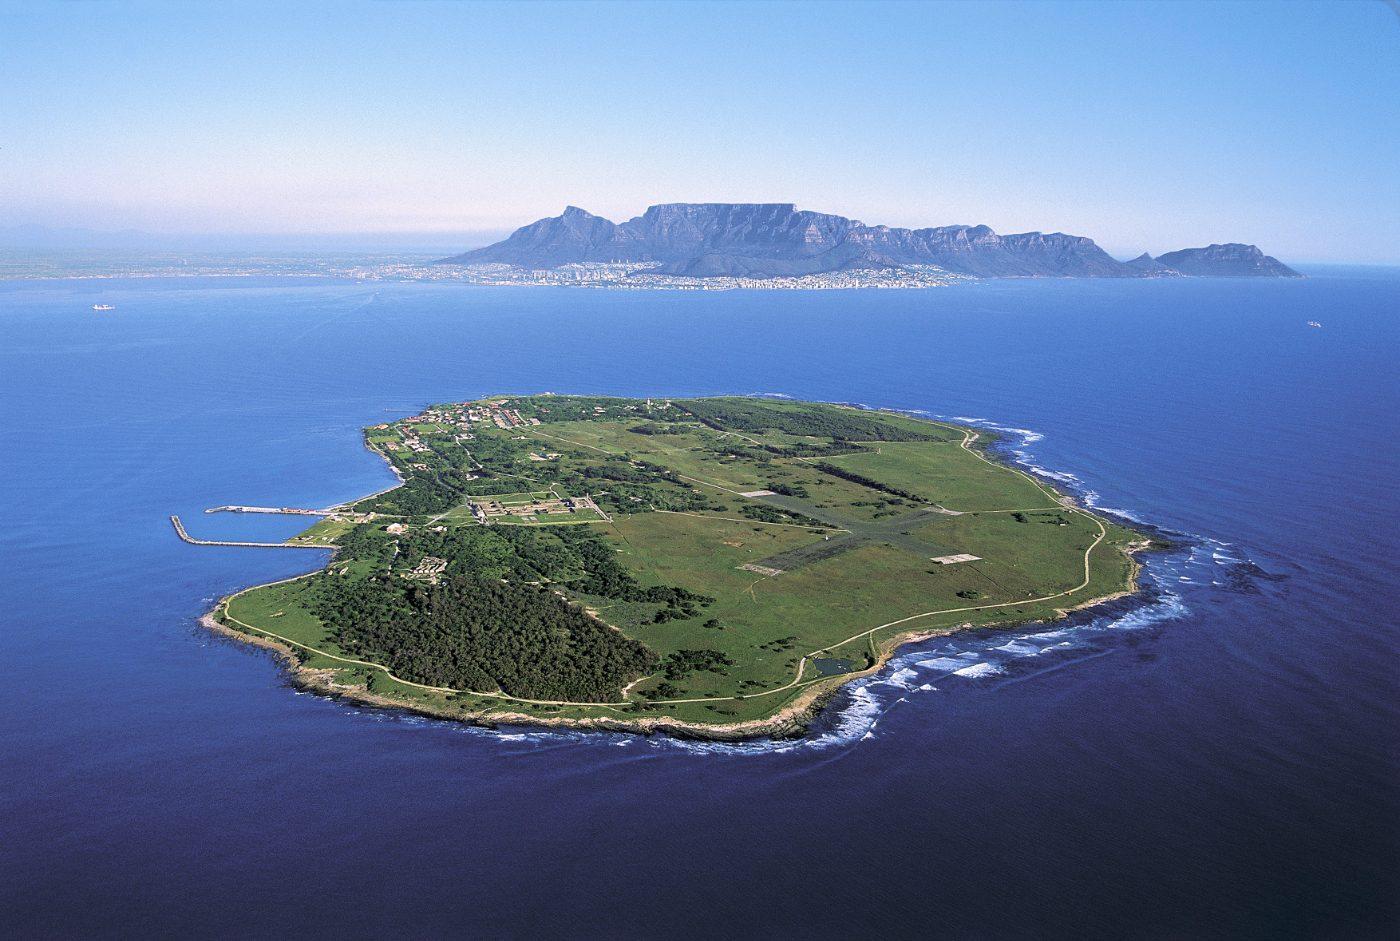 Hölleninsel Robben Island